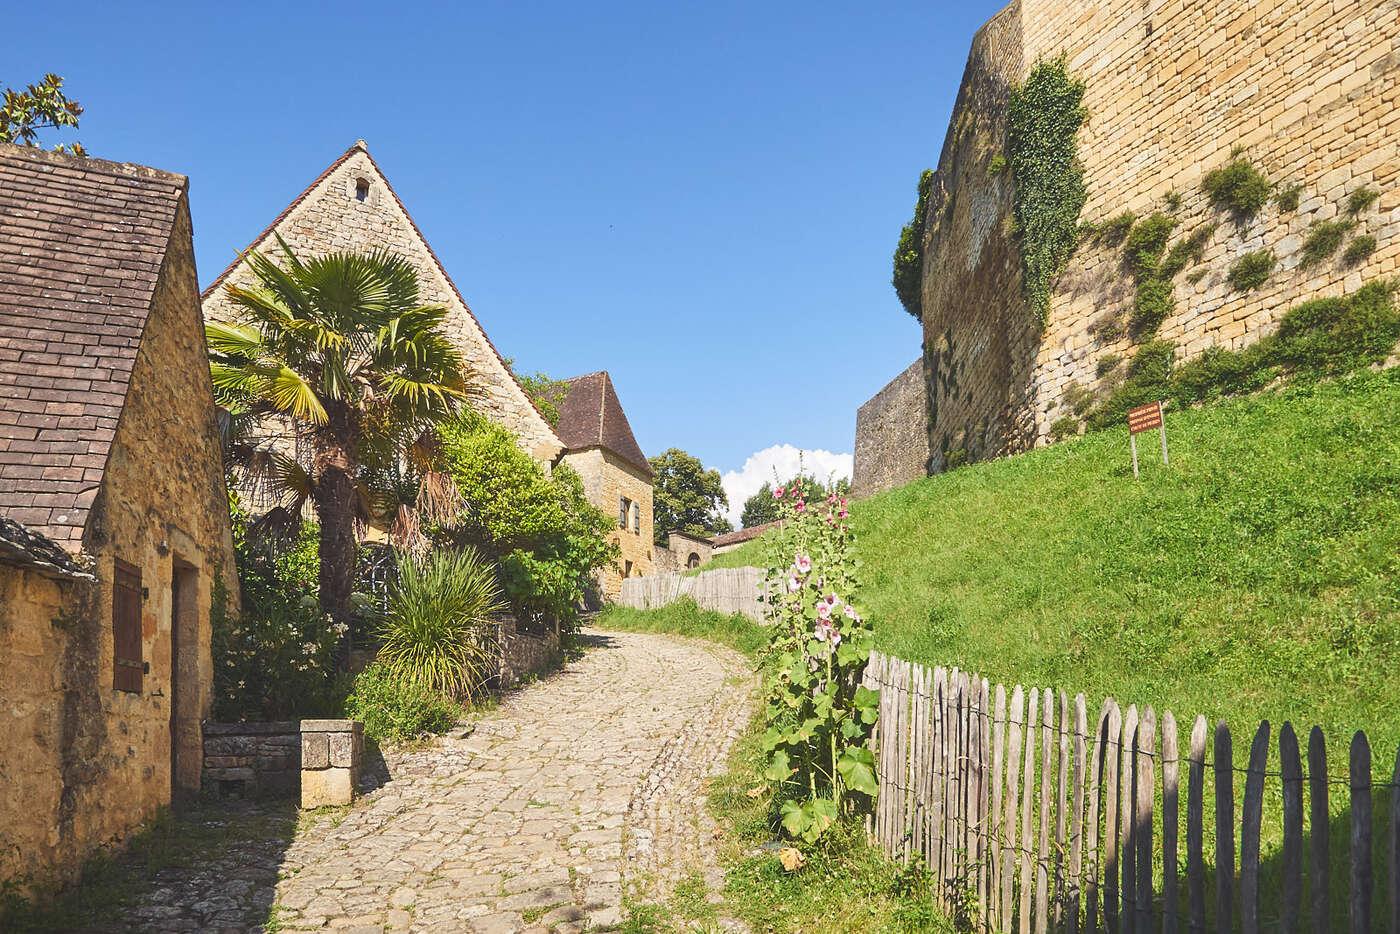 Murailles du château de Beynac